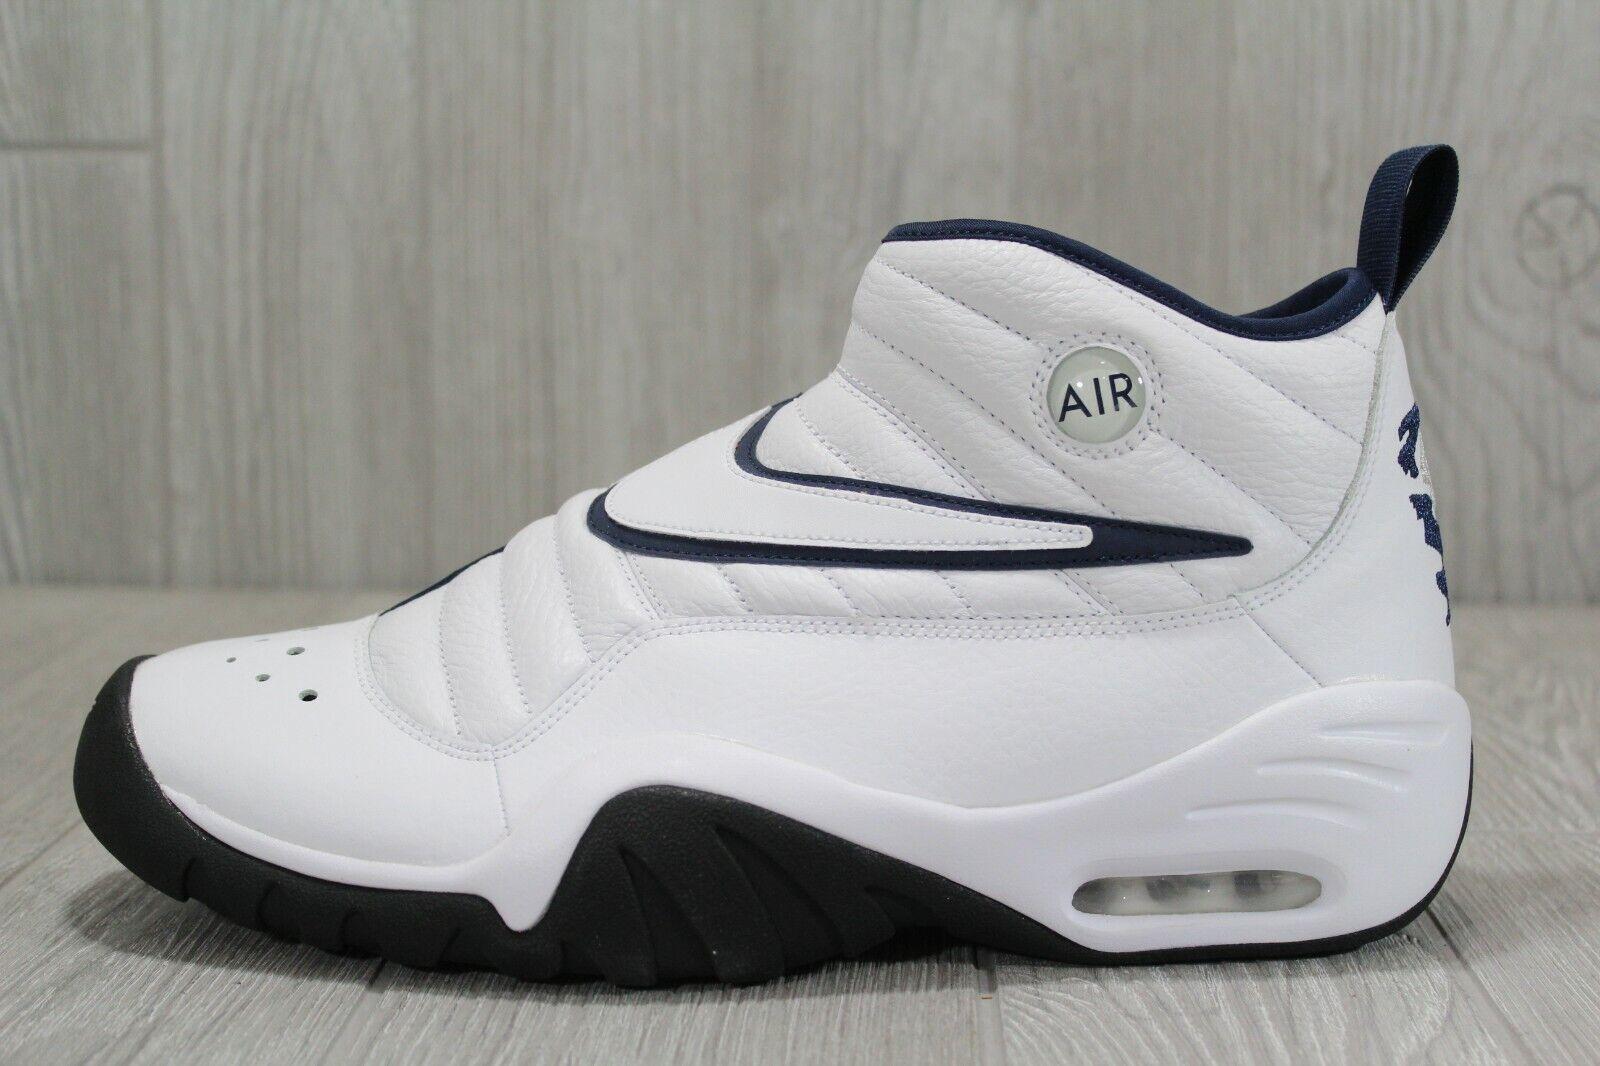 38 Nike Air Shake NDestrukt White Black Rodman Basket shoes 10 - 13 880869-102